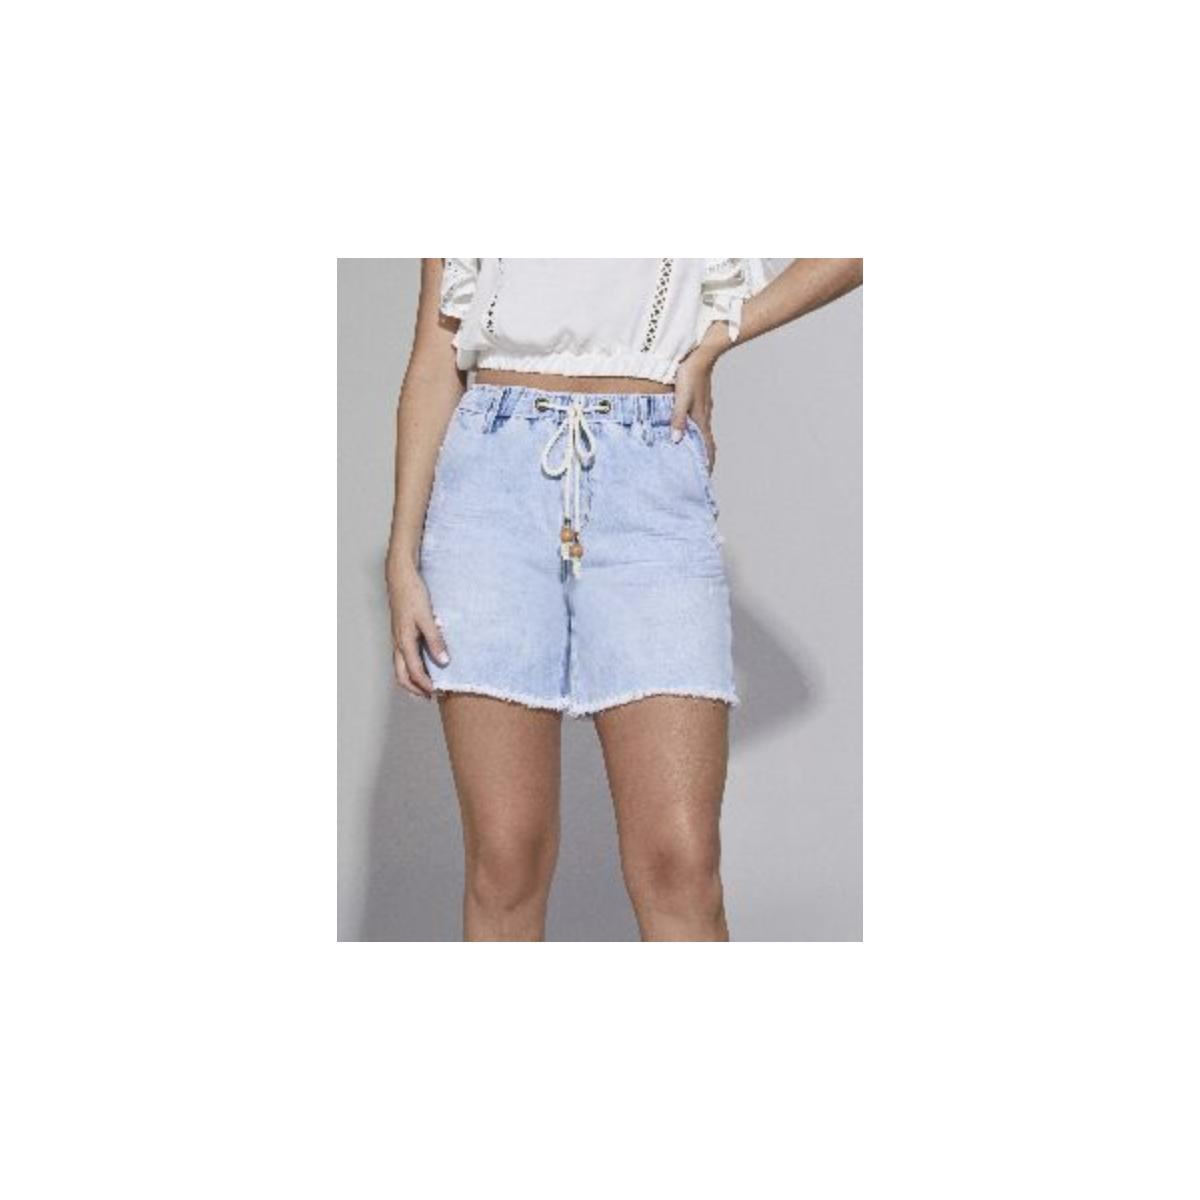 Short Feminino Lado Avesso L114151 Jeans